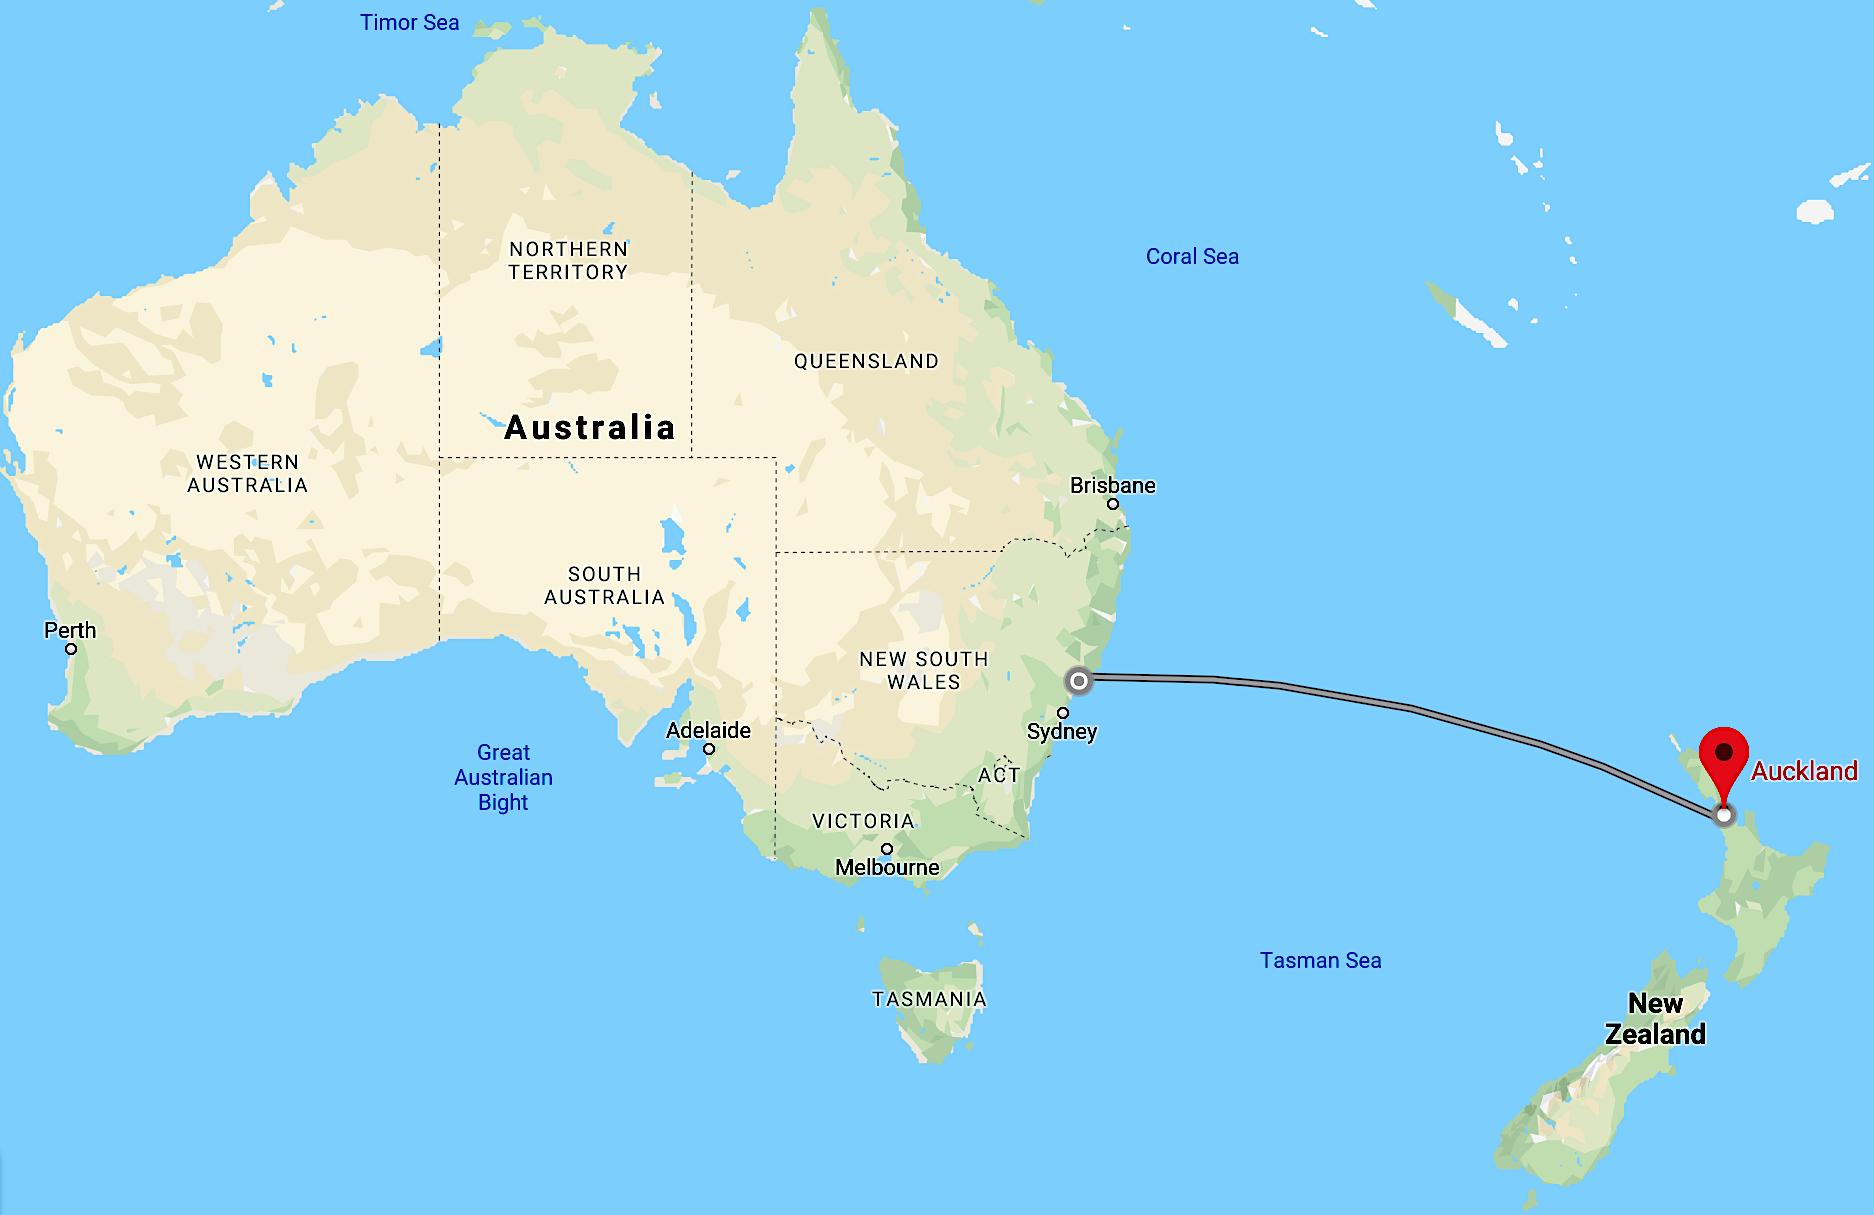 New Zealand sees effects of Australia bushfires burning more ...